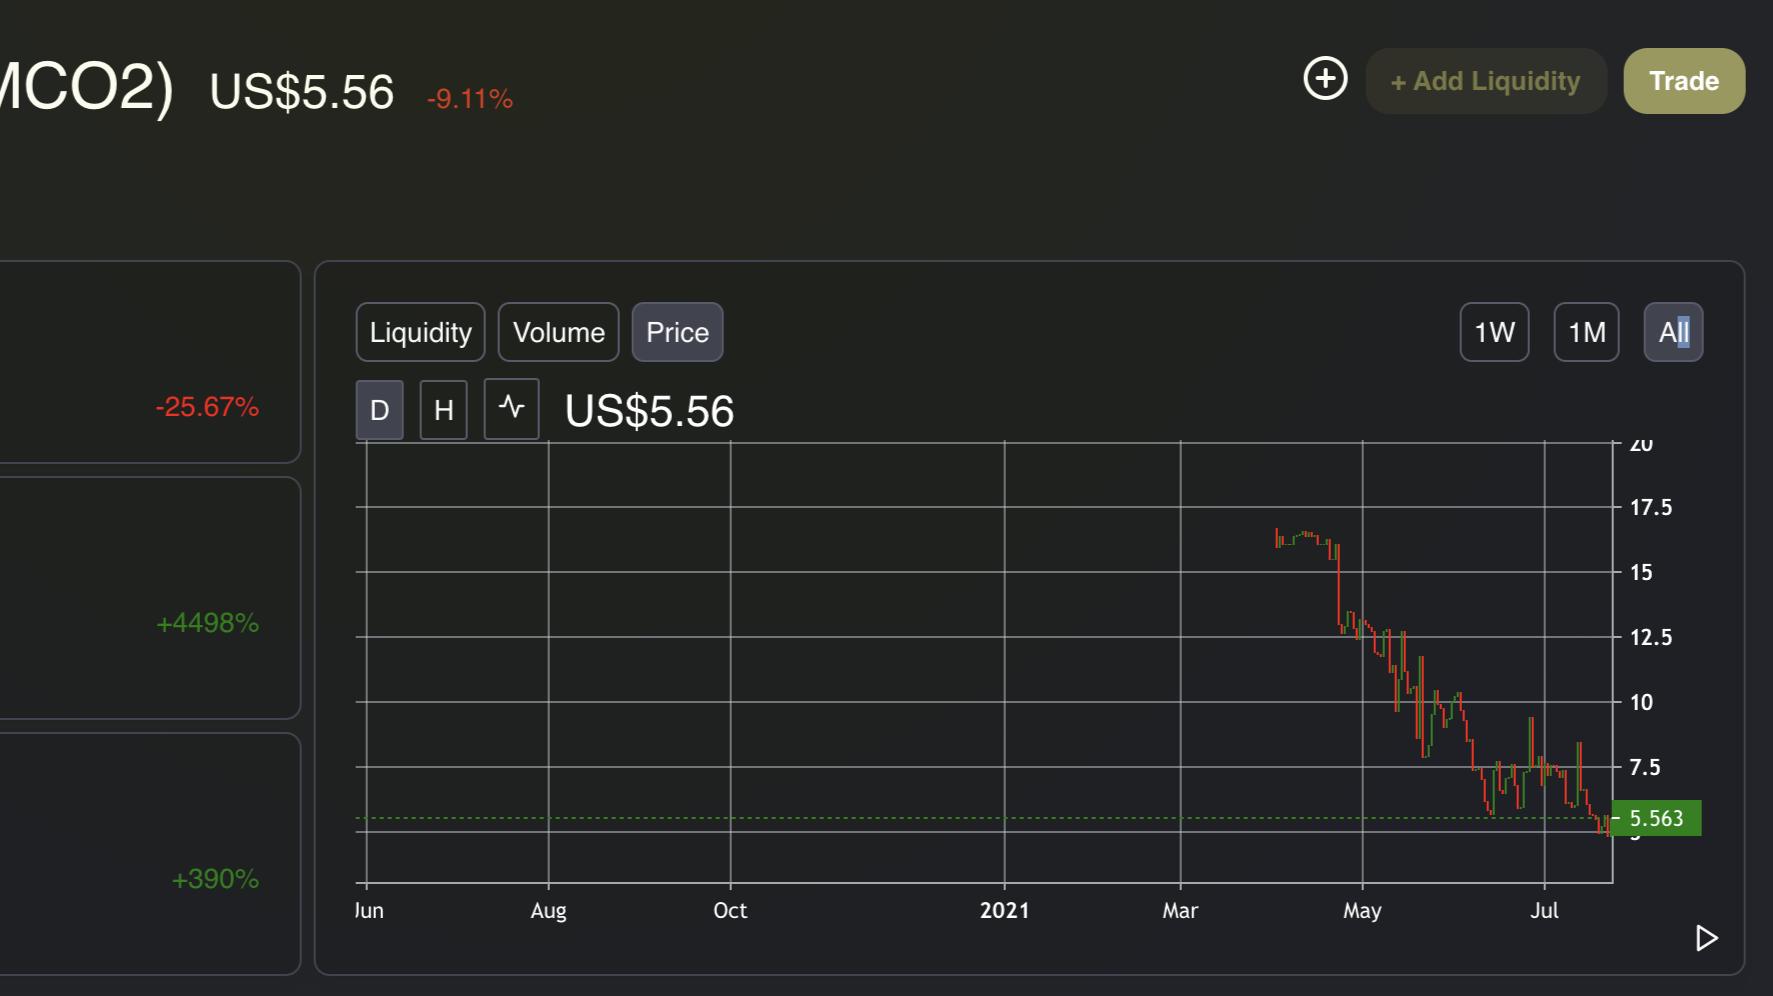 MCO2 price chart